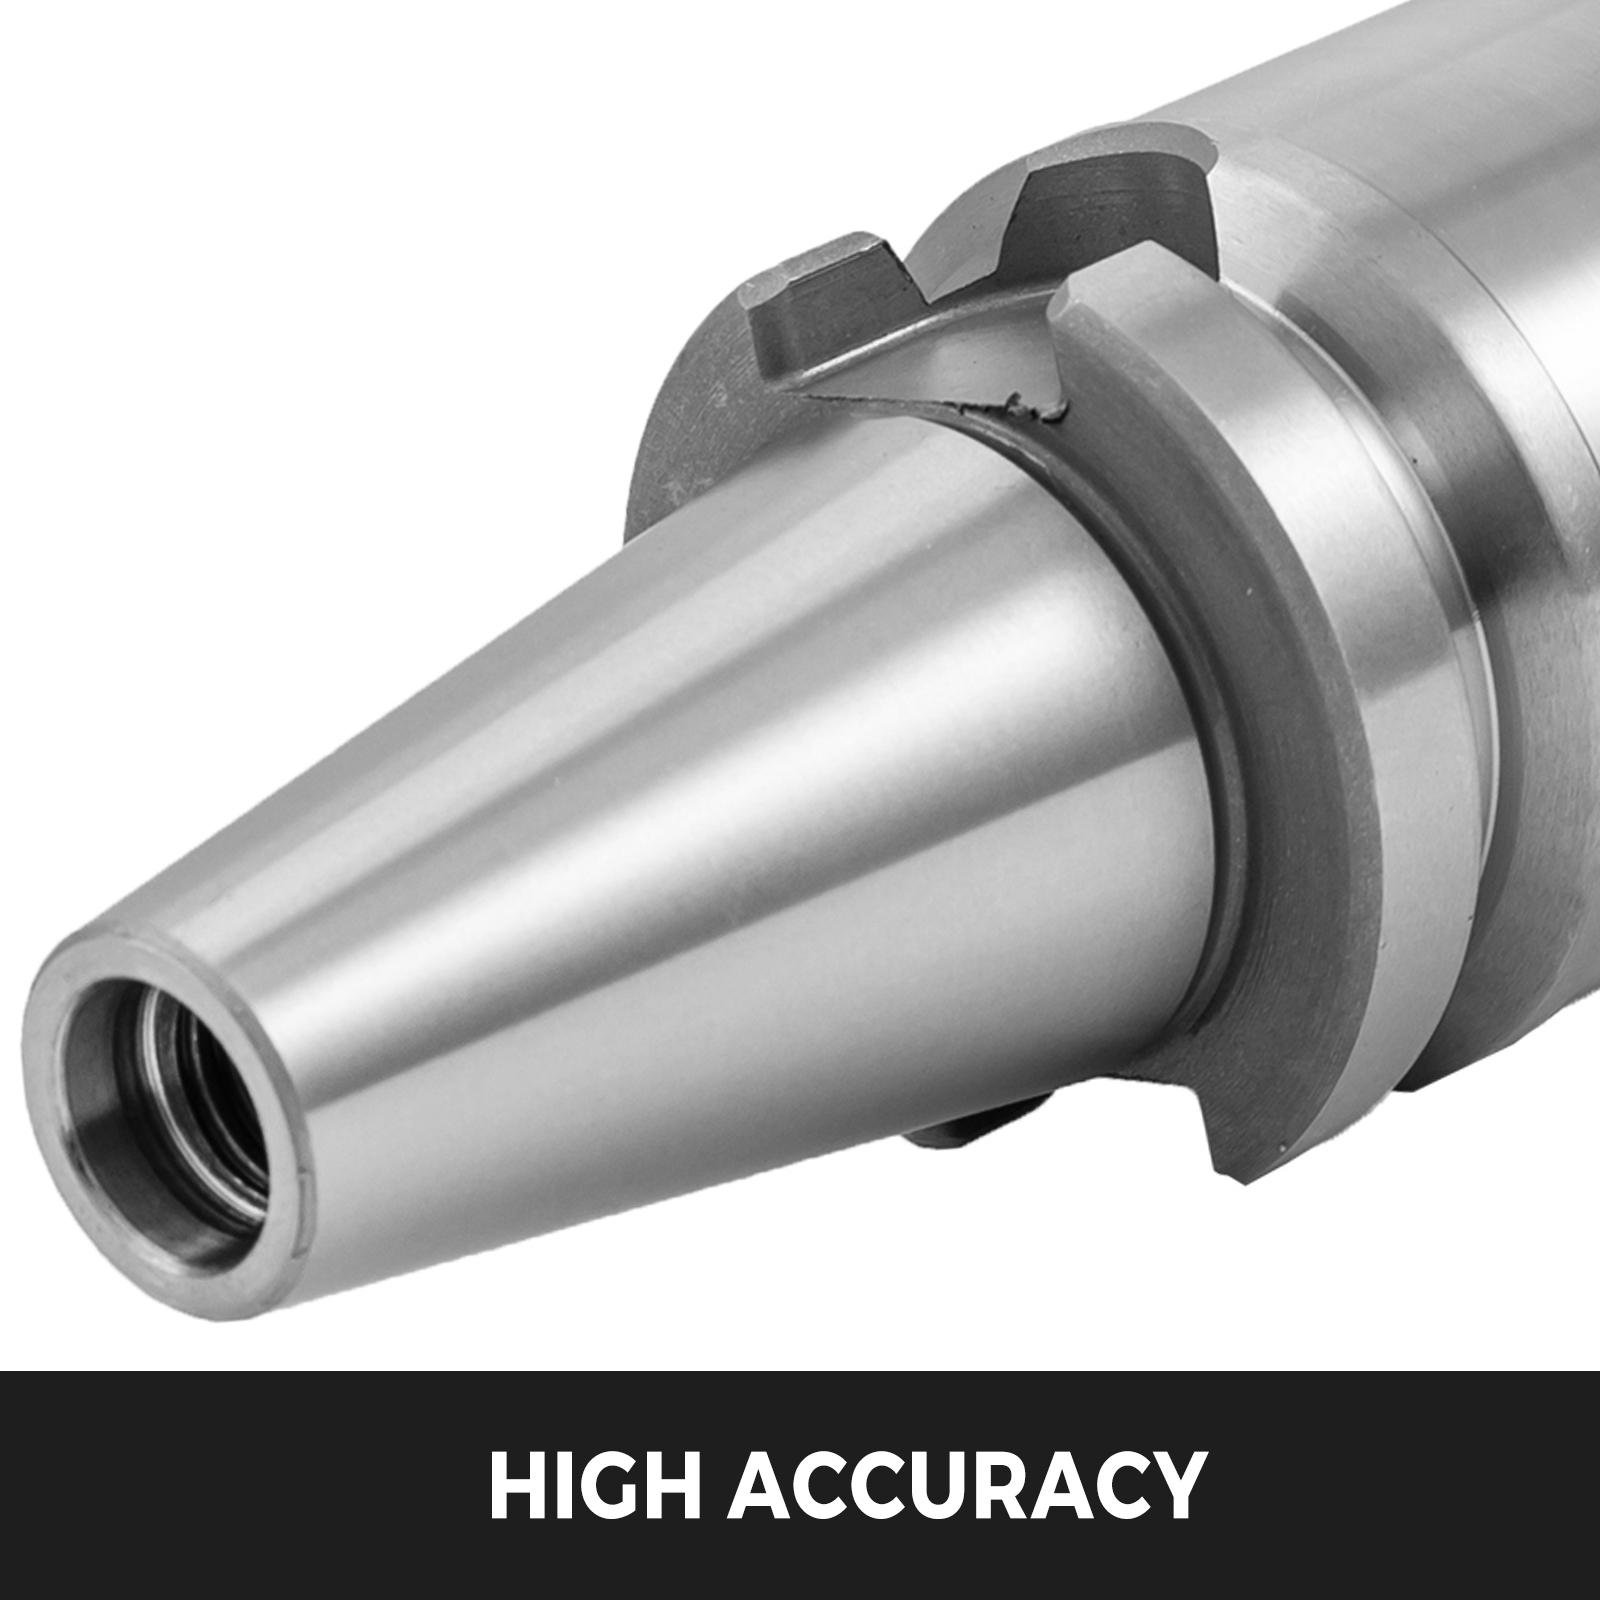 BT30 ER32 Collet Chuck 2.75/'/'//4/'/' w// Wrench Tool Holder 40Cr Frame Precision